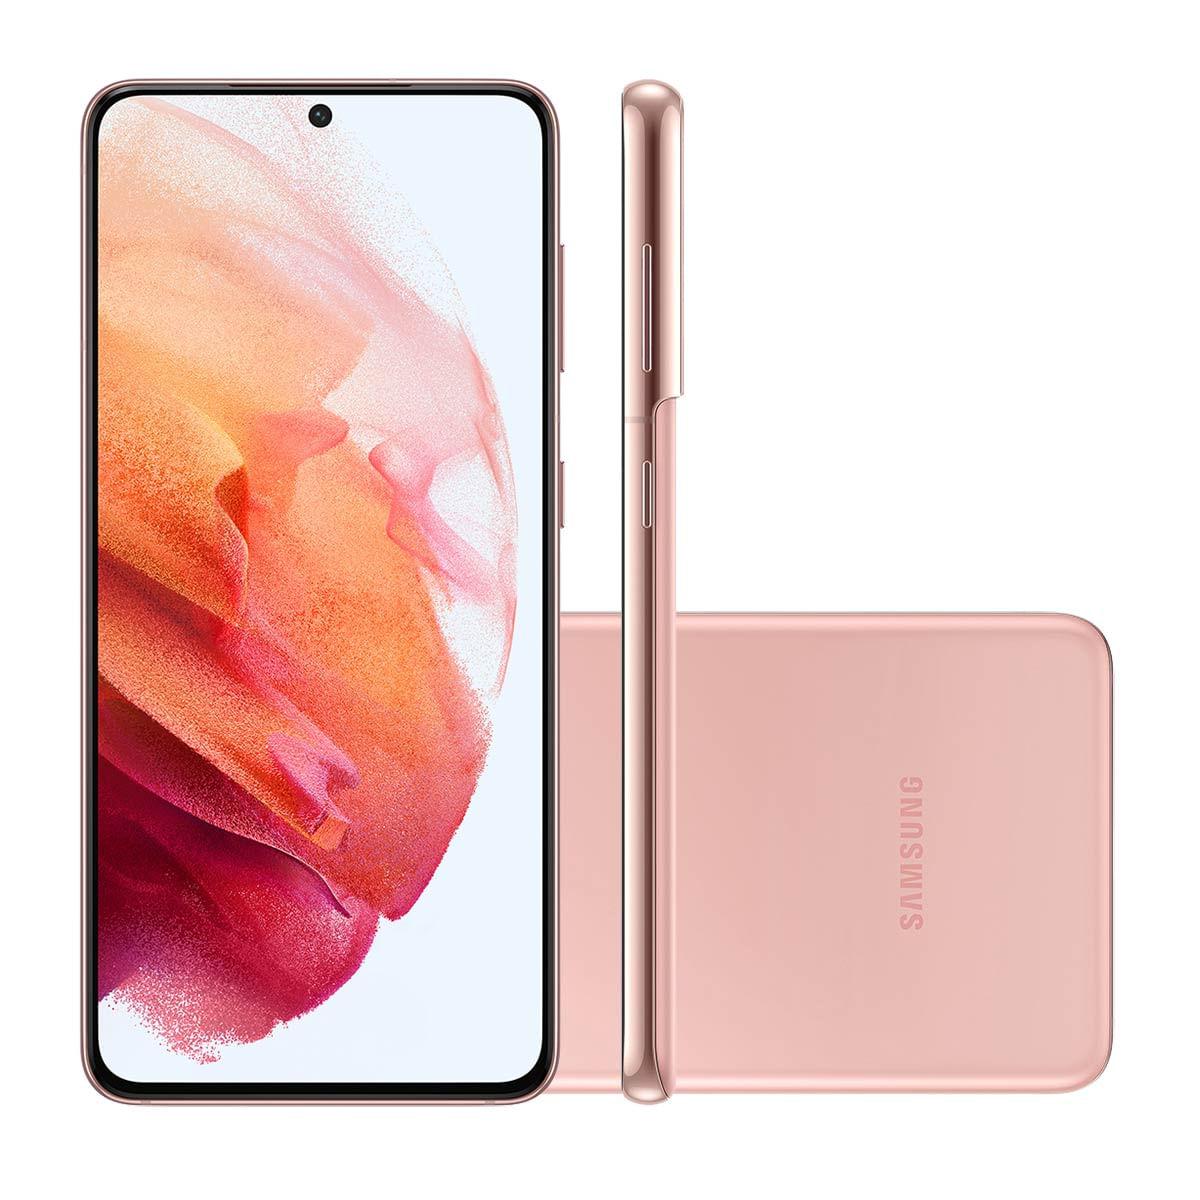 "Smartphone Samsung Galaxy S21 5G 128GB Rosa Tela 6.2"" Câmera Tripla 64MP Selfie 10MP Dual Chip Android 11"